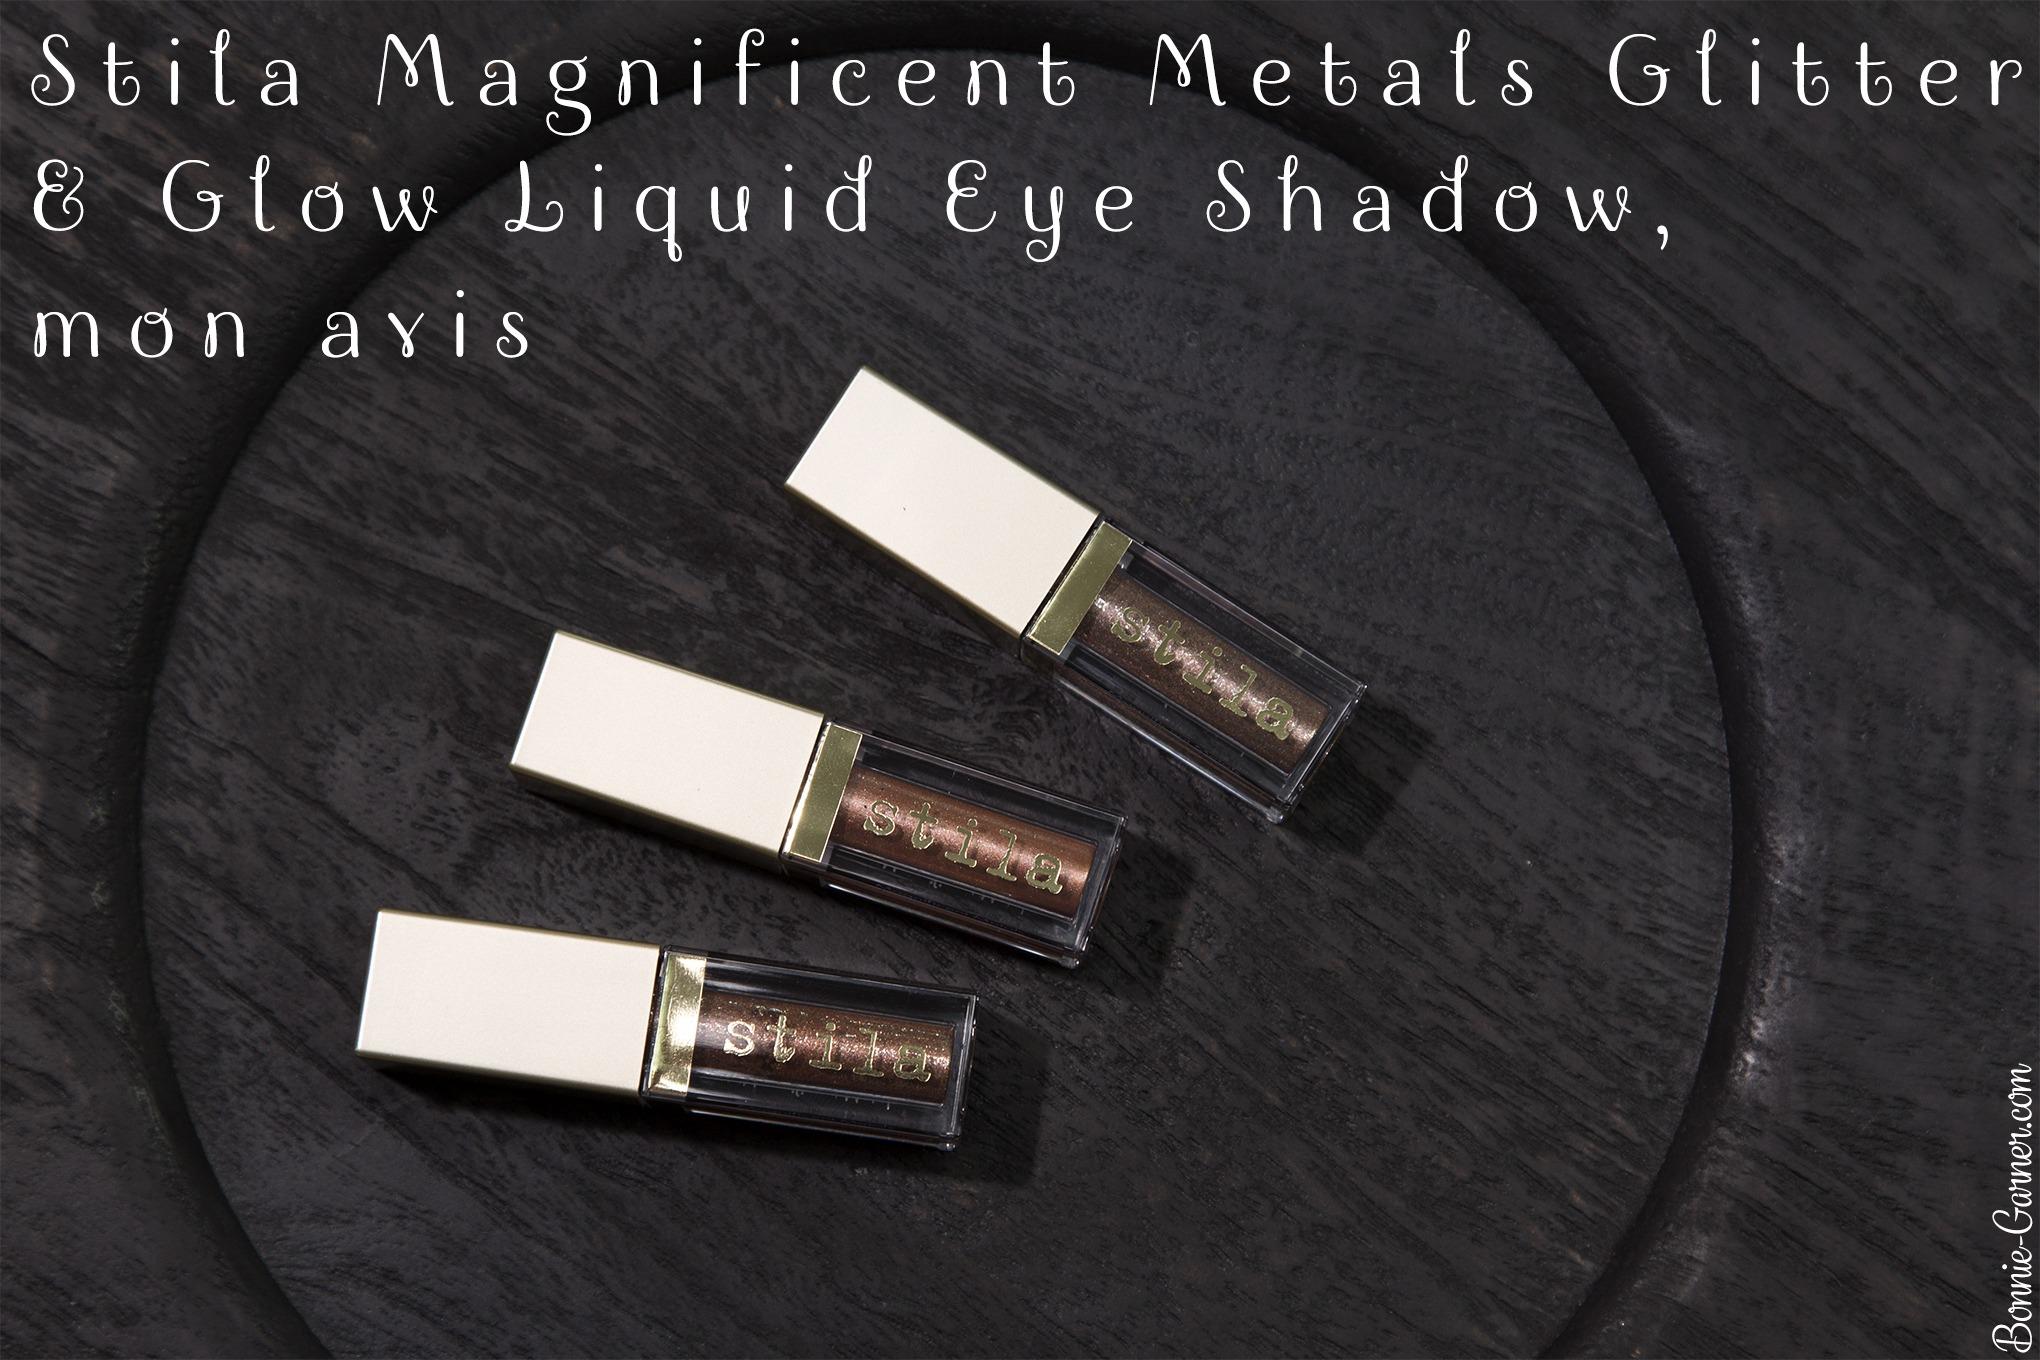 Stila Magnificent Metals Glitter & Glow Liquid Eye Shadow, mon avis